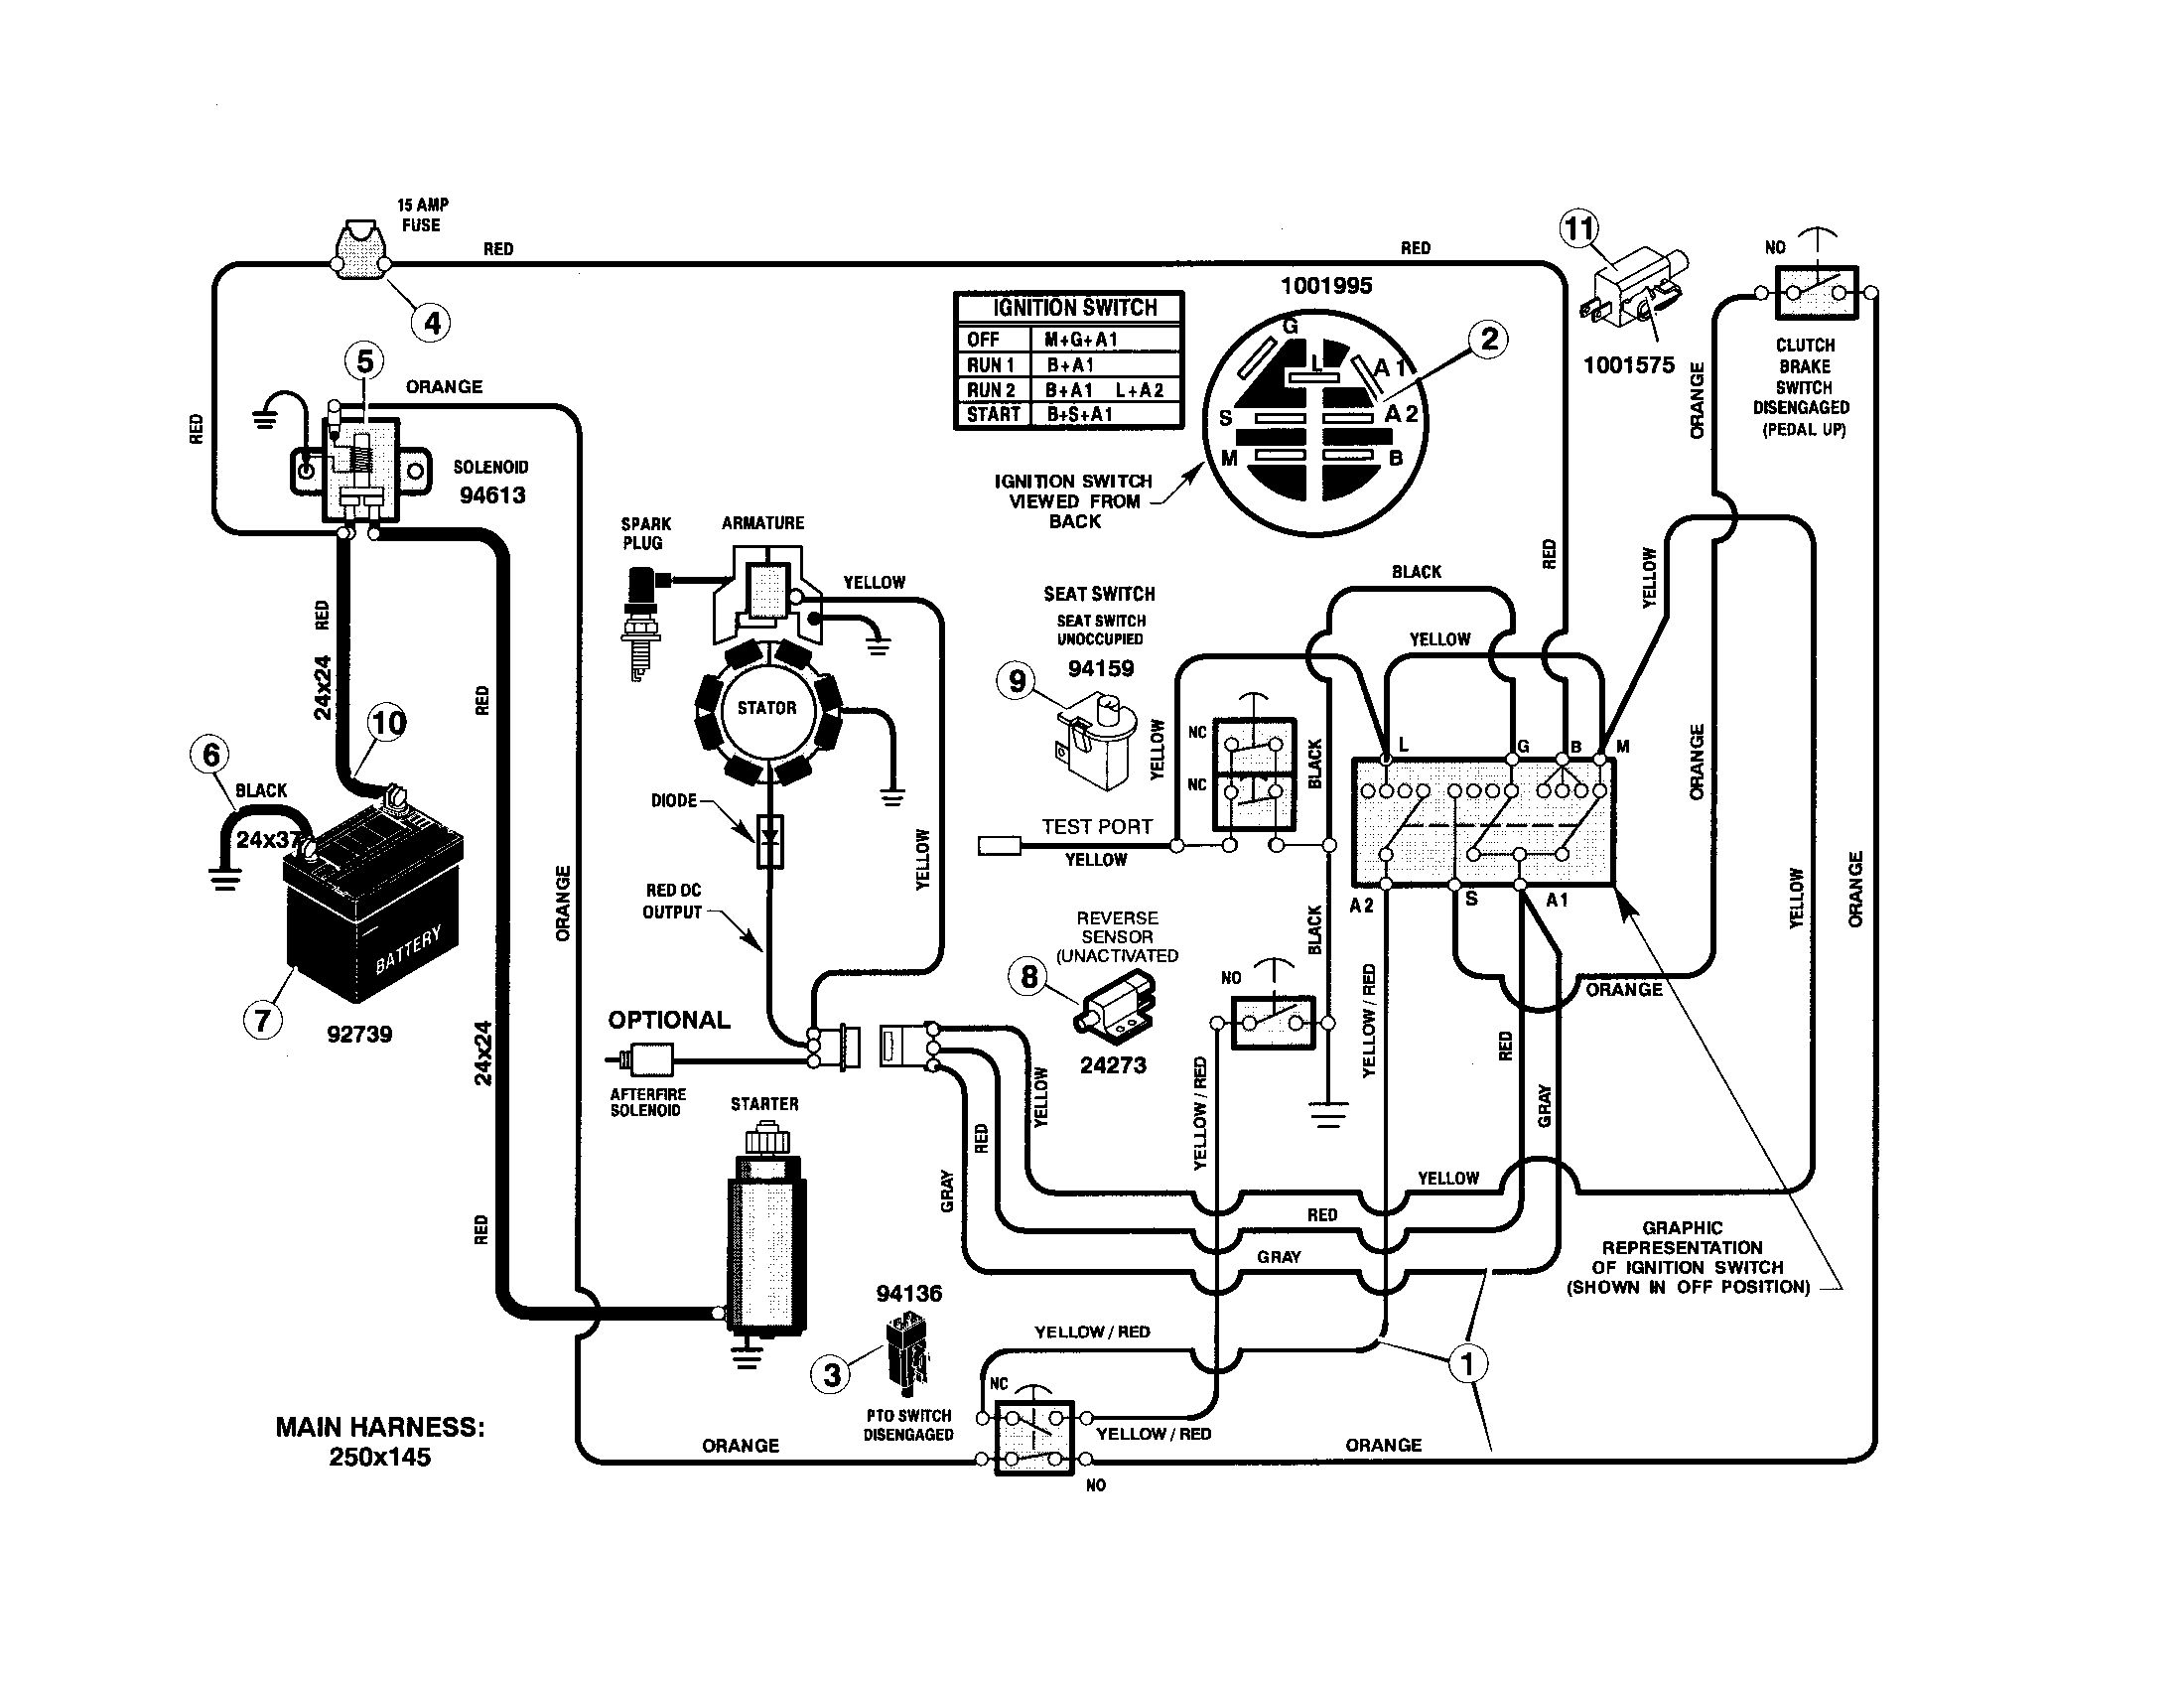 Toro Zero Turn Wiring Diagram likewise OE7r 16489 further Wiring Diagram as well Kia Sedona Fuel Tank Wiring Diagram likewise Battery And Electrical Assembly. on riding mower fuel solenoid wiring diagram